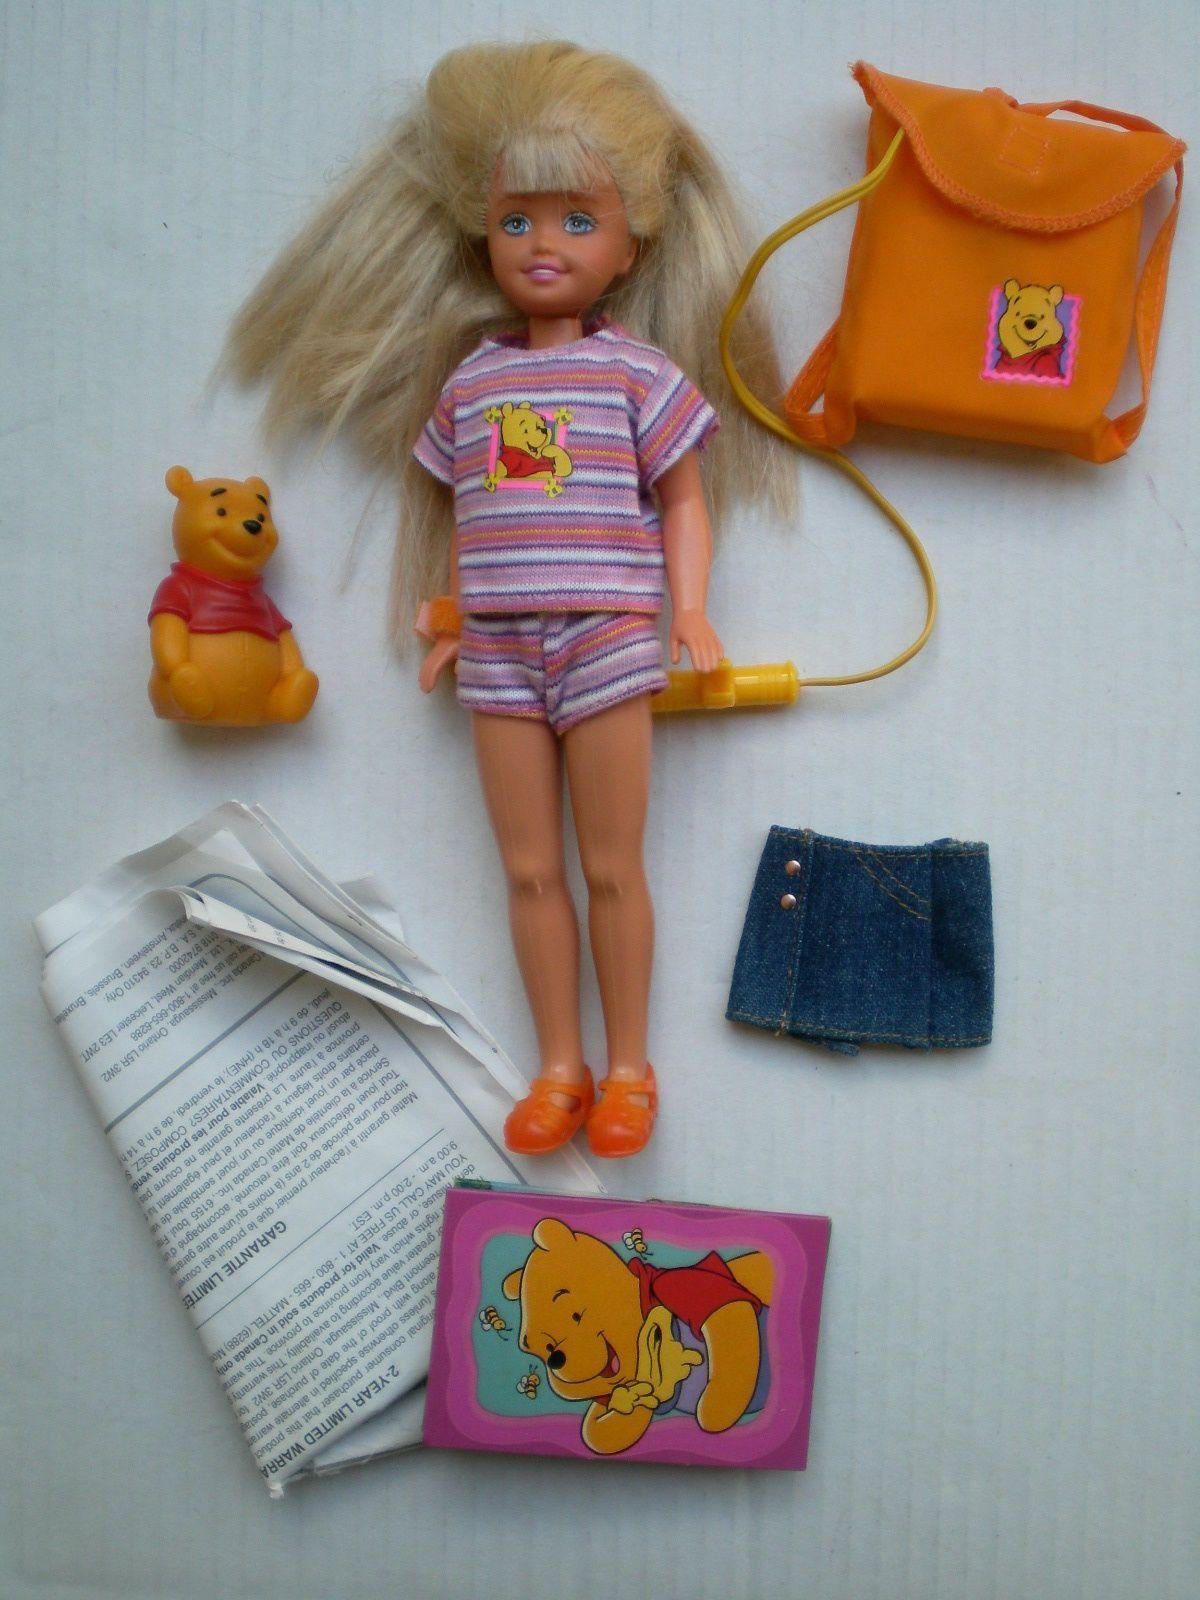 Barbie Sister Stacie And Winnie The Pooh Doll Set 1997 Mattel | eBay ...